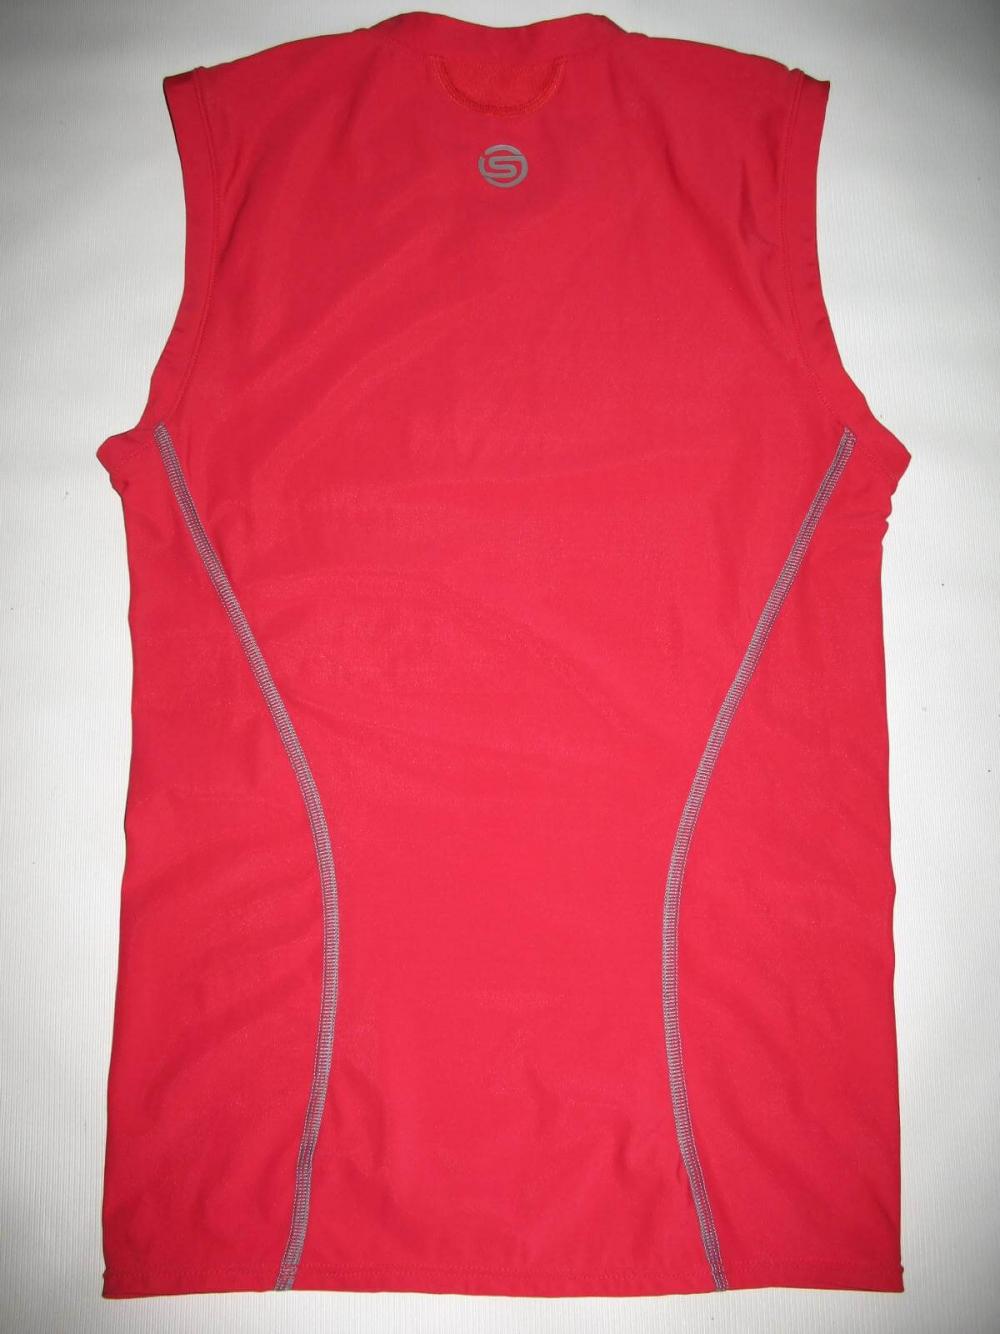 Футболка SKINS A200 compression sleeveless top (размер M) - 1